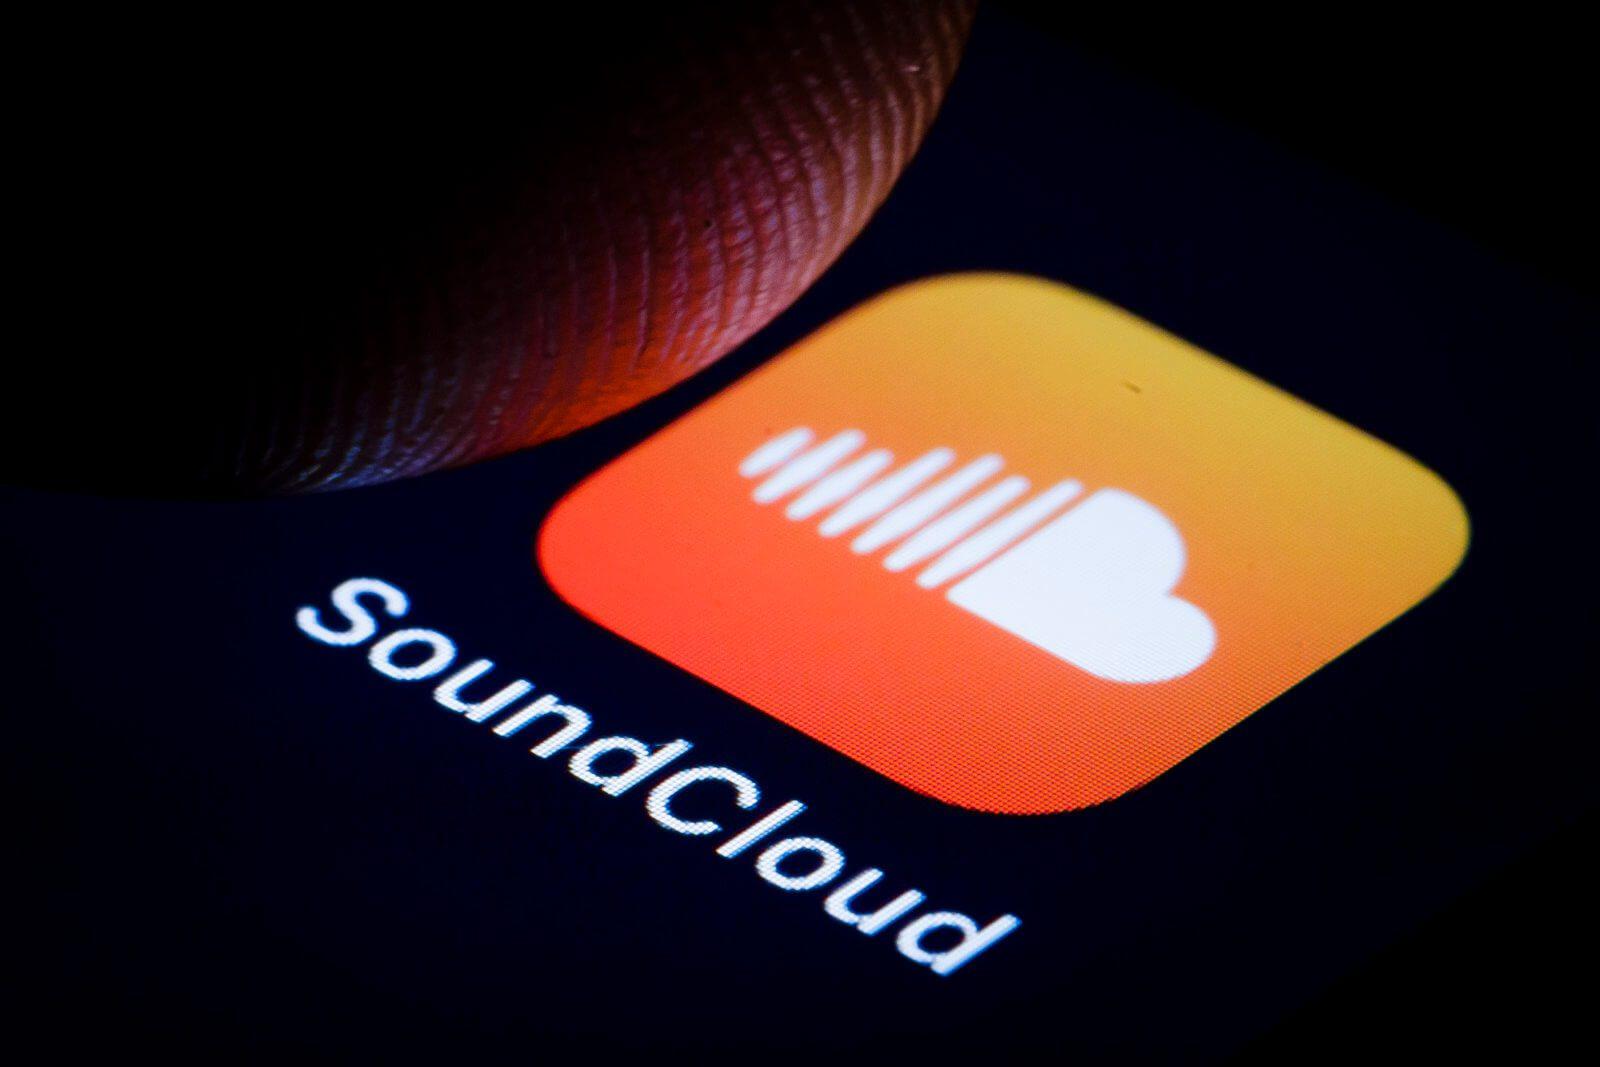 Energian Saasto—These Legit Soundcloud Promotion Reddit